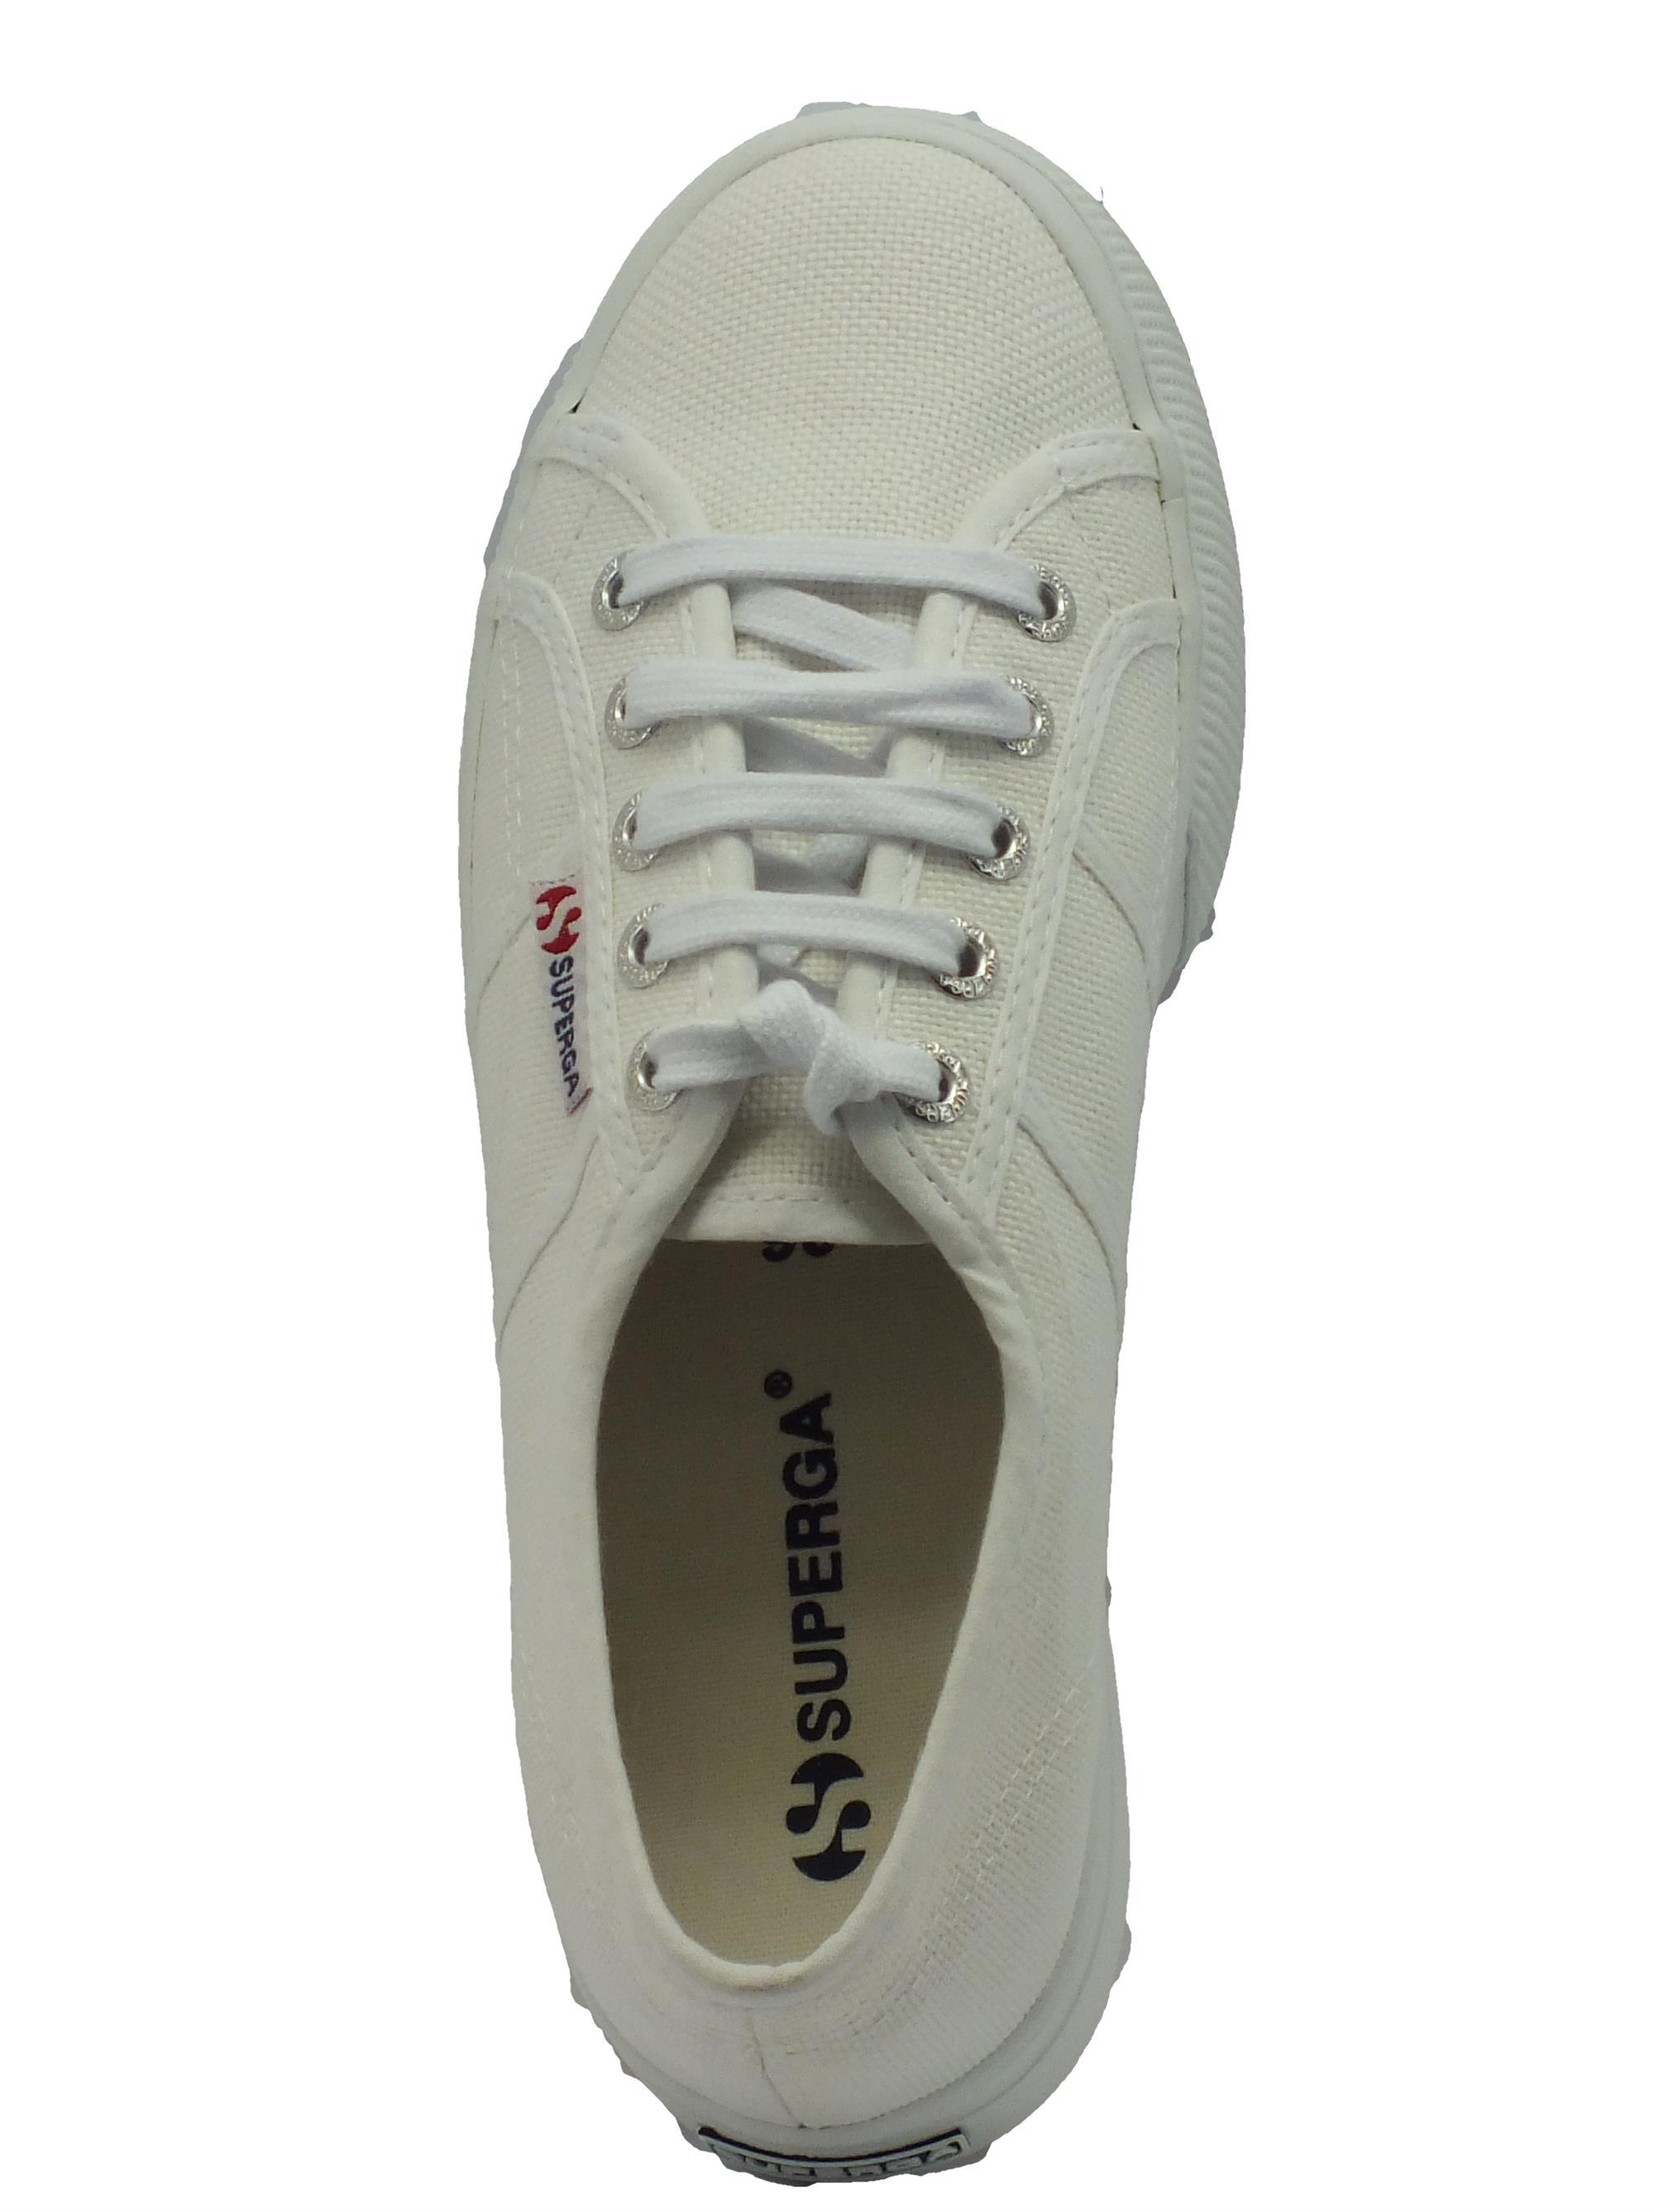 Scarpe Superga donna tessuto bianco zeppa alta - Vitiello Calzature 52474963aa6